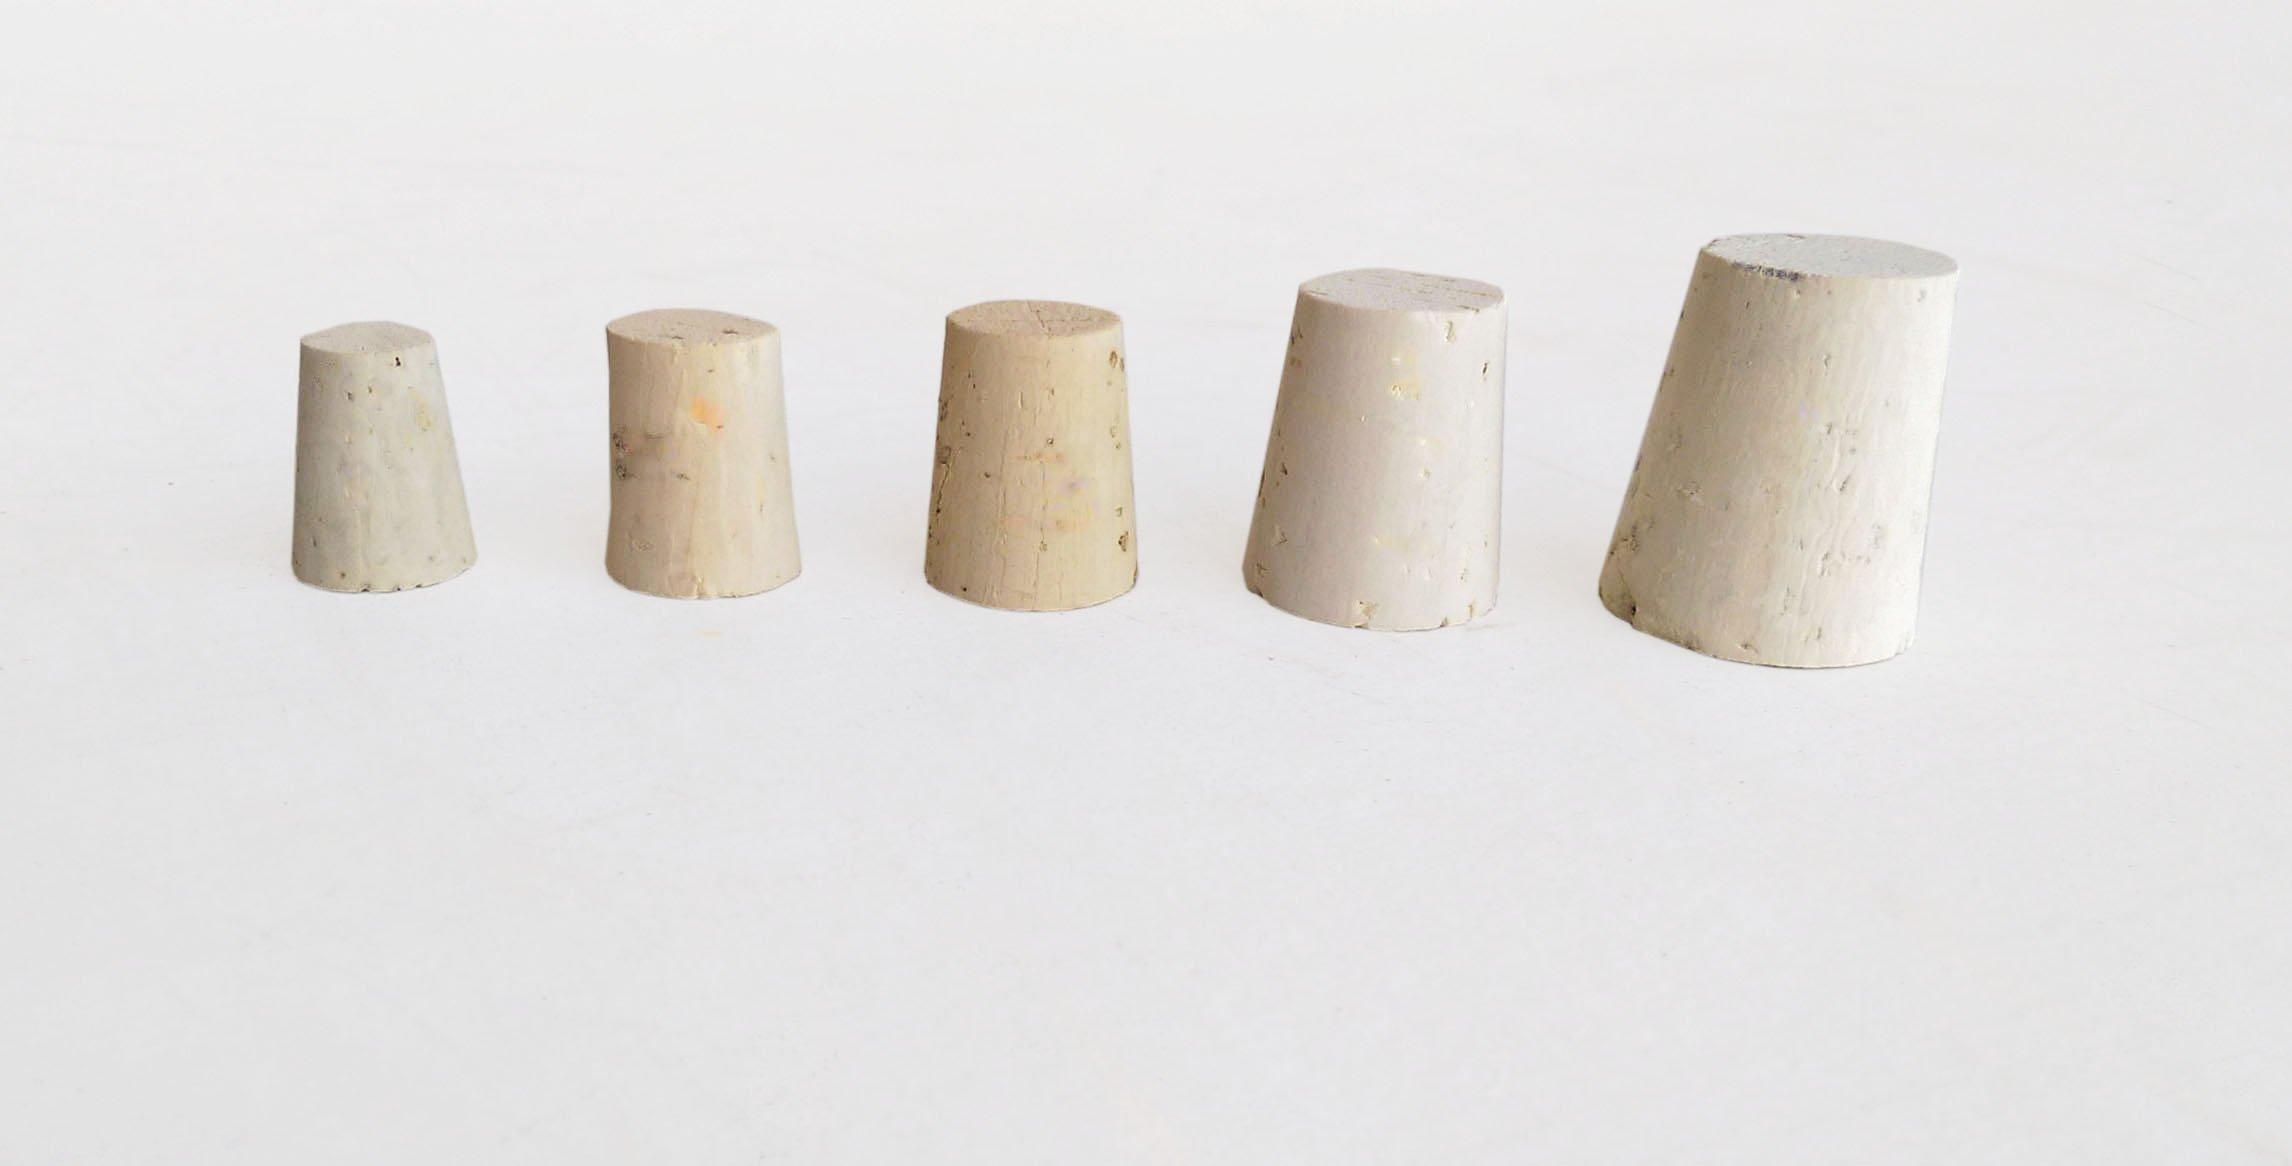 Small bag of Mixed Regular Length (RL) Natural Tapered Corks Bag of 45 (RL04, RL05, RL06, RL08, RL10) by Jelinek Cork Group (Image #2)